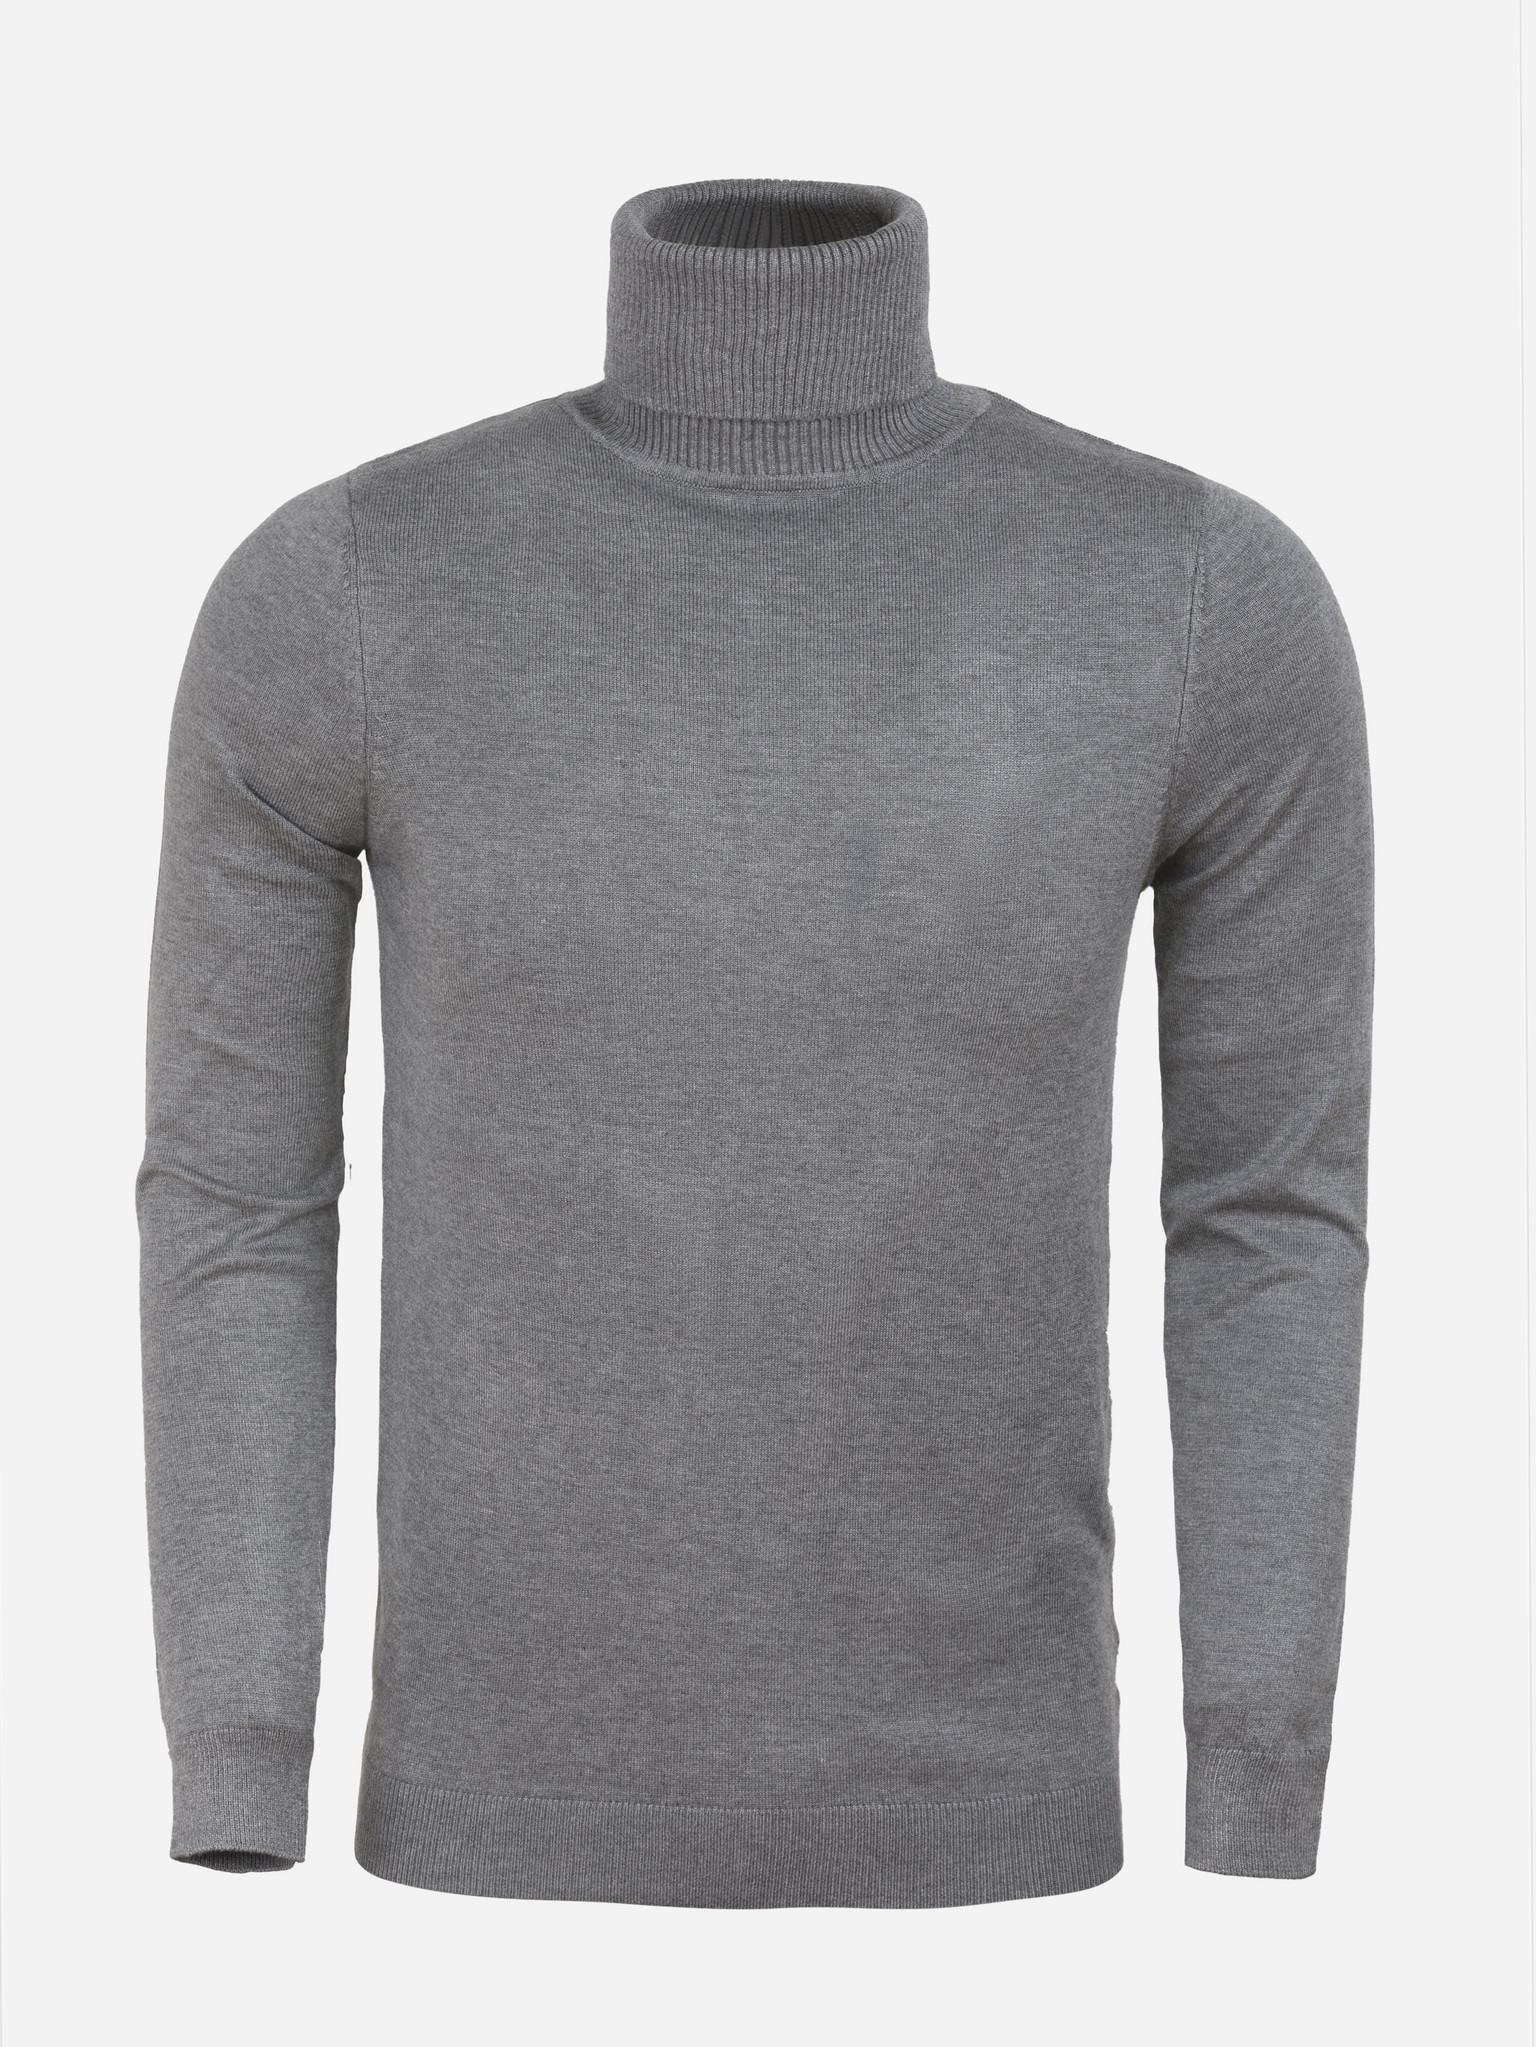 Blueberyl Sweater BK Maat: 2XL